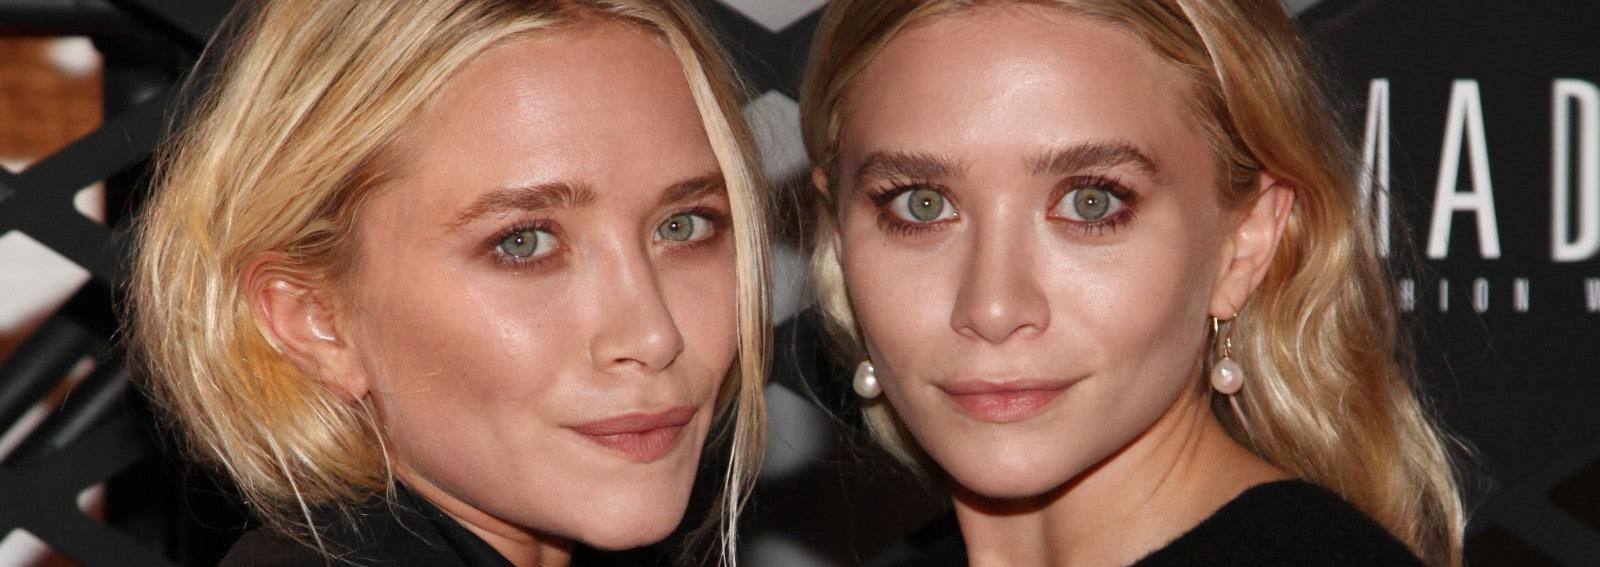 Mary-Kate e Ashley Olsen hero